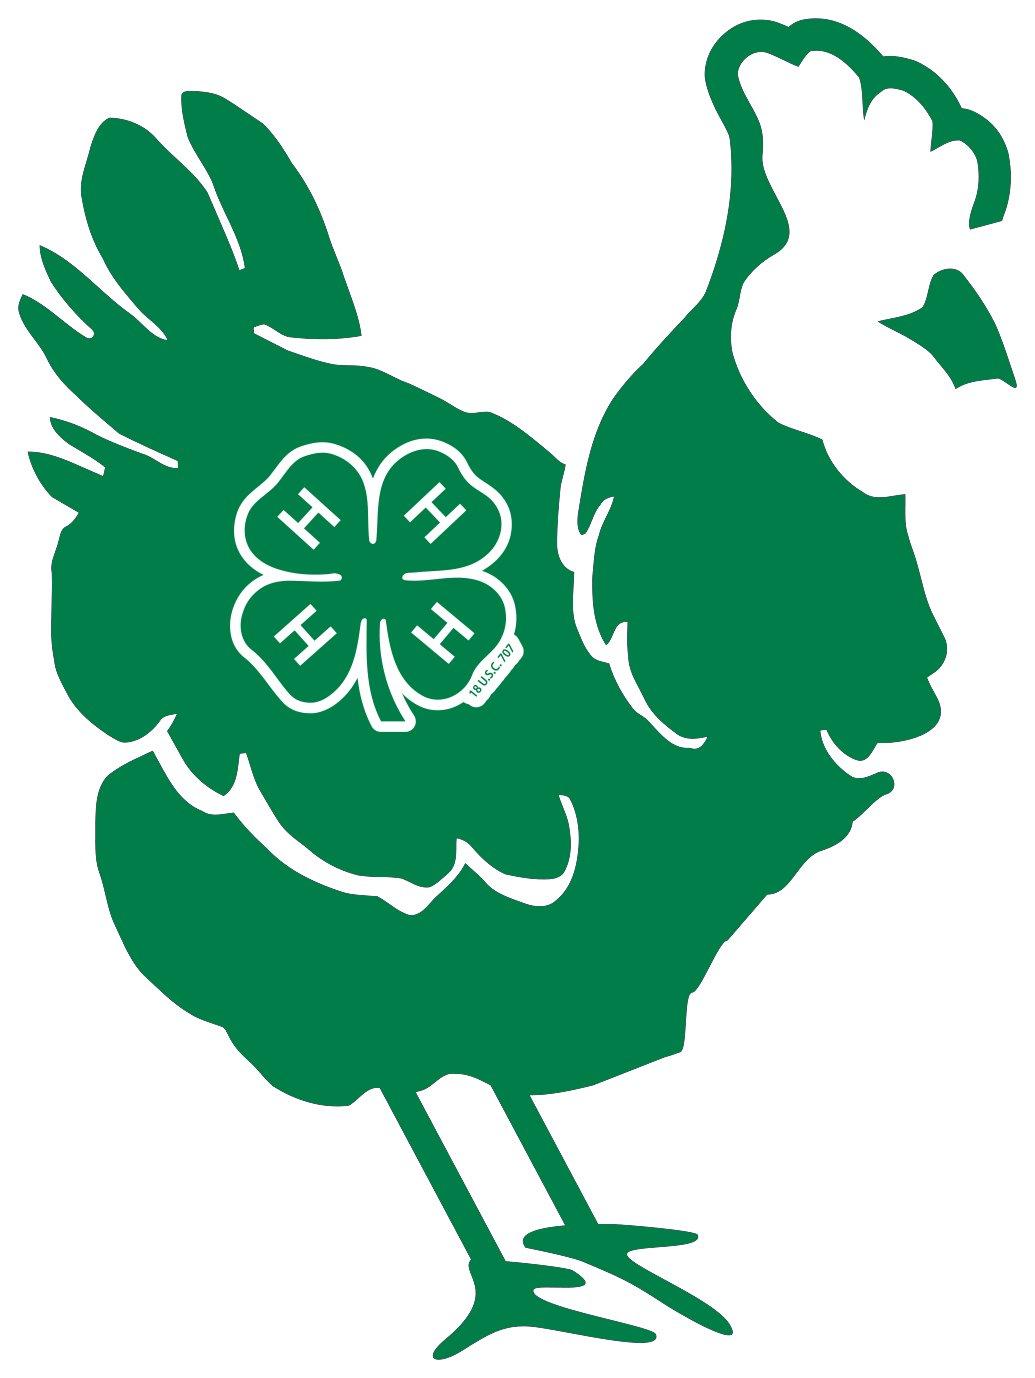 4-H chicken logo image